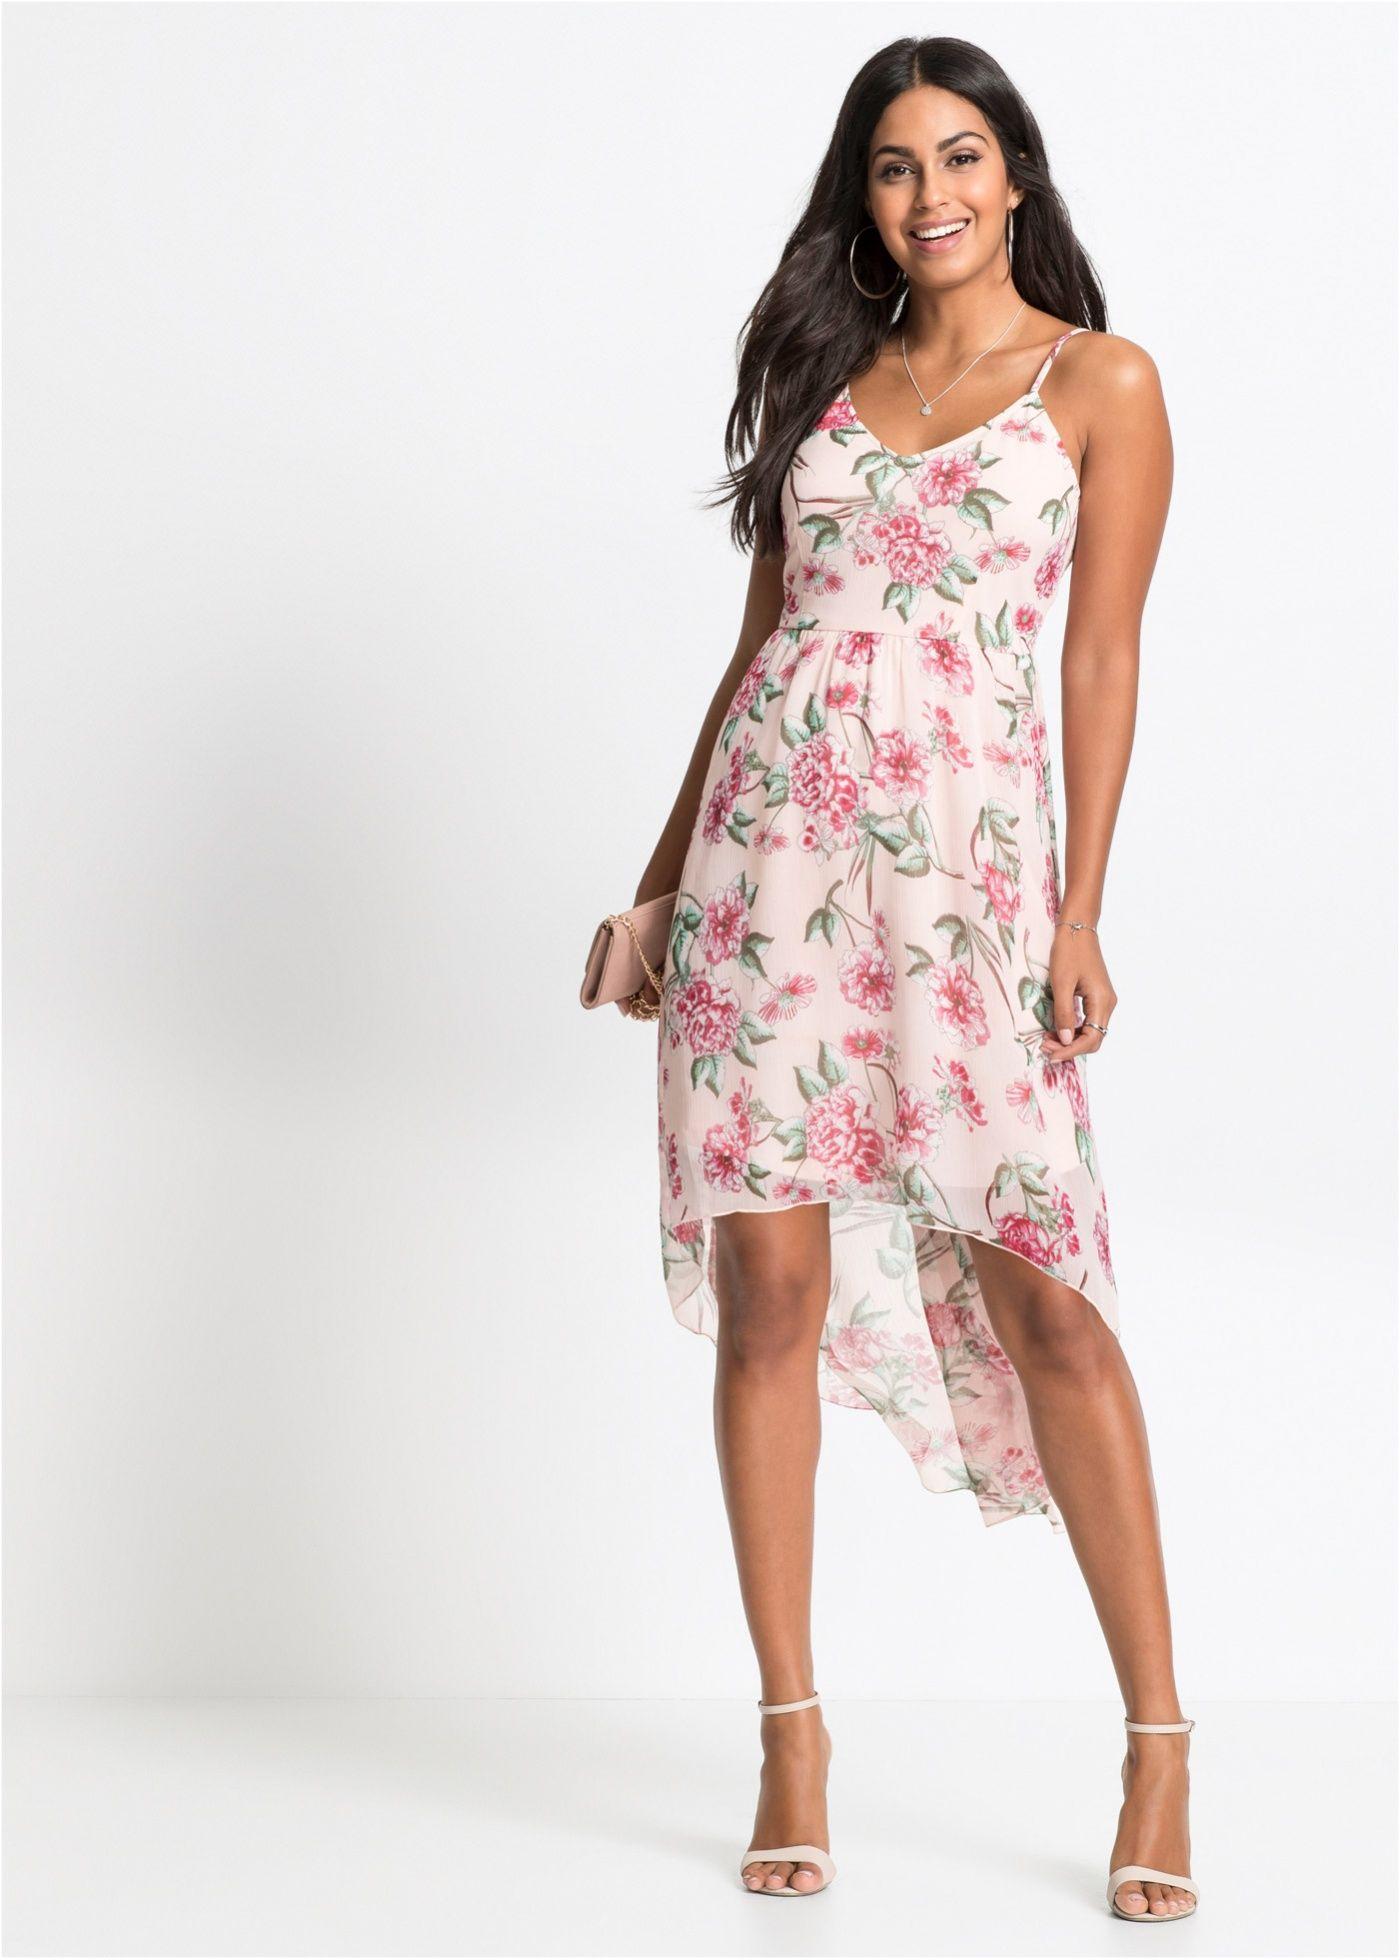 e097c9a93d8745 Kleid mit Blumenprint rosa geblümt jetzt im Online Shop von bonprix.de ab €  36